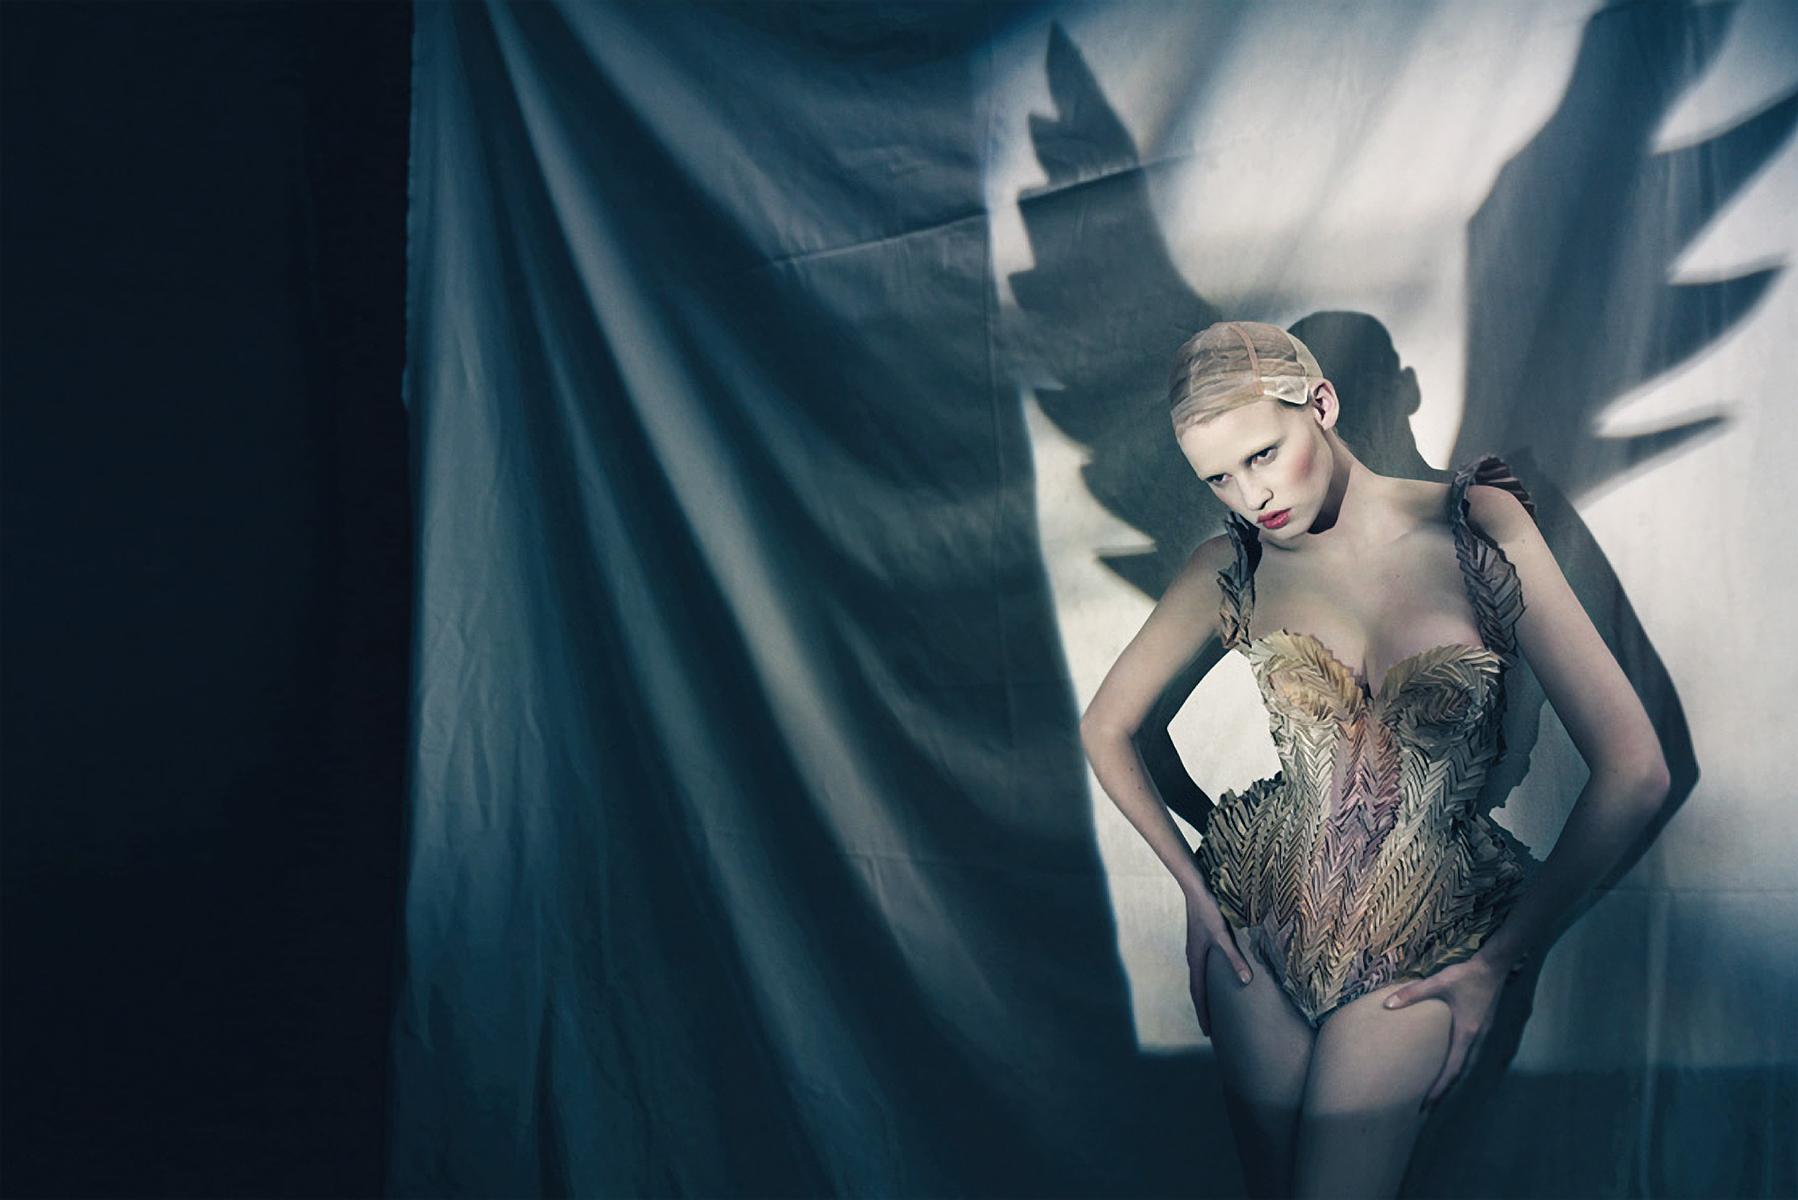 Paolo Roversi - Lara Stone - stylist Olivier Rizzo - designer Jean Paul Gaultier